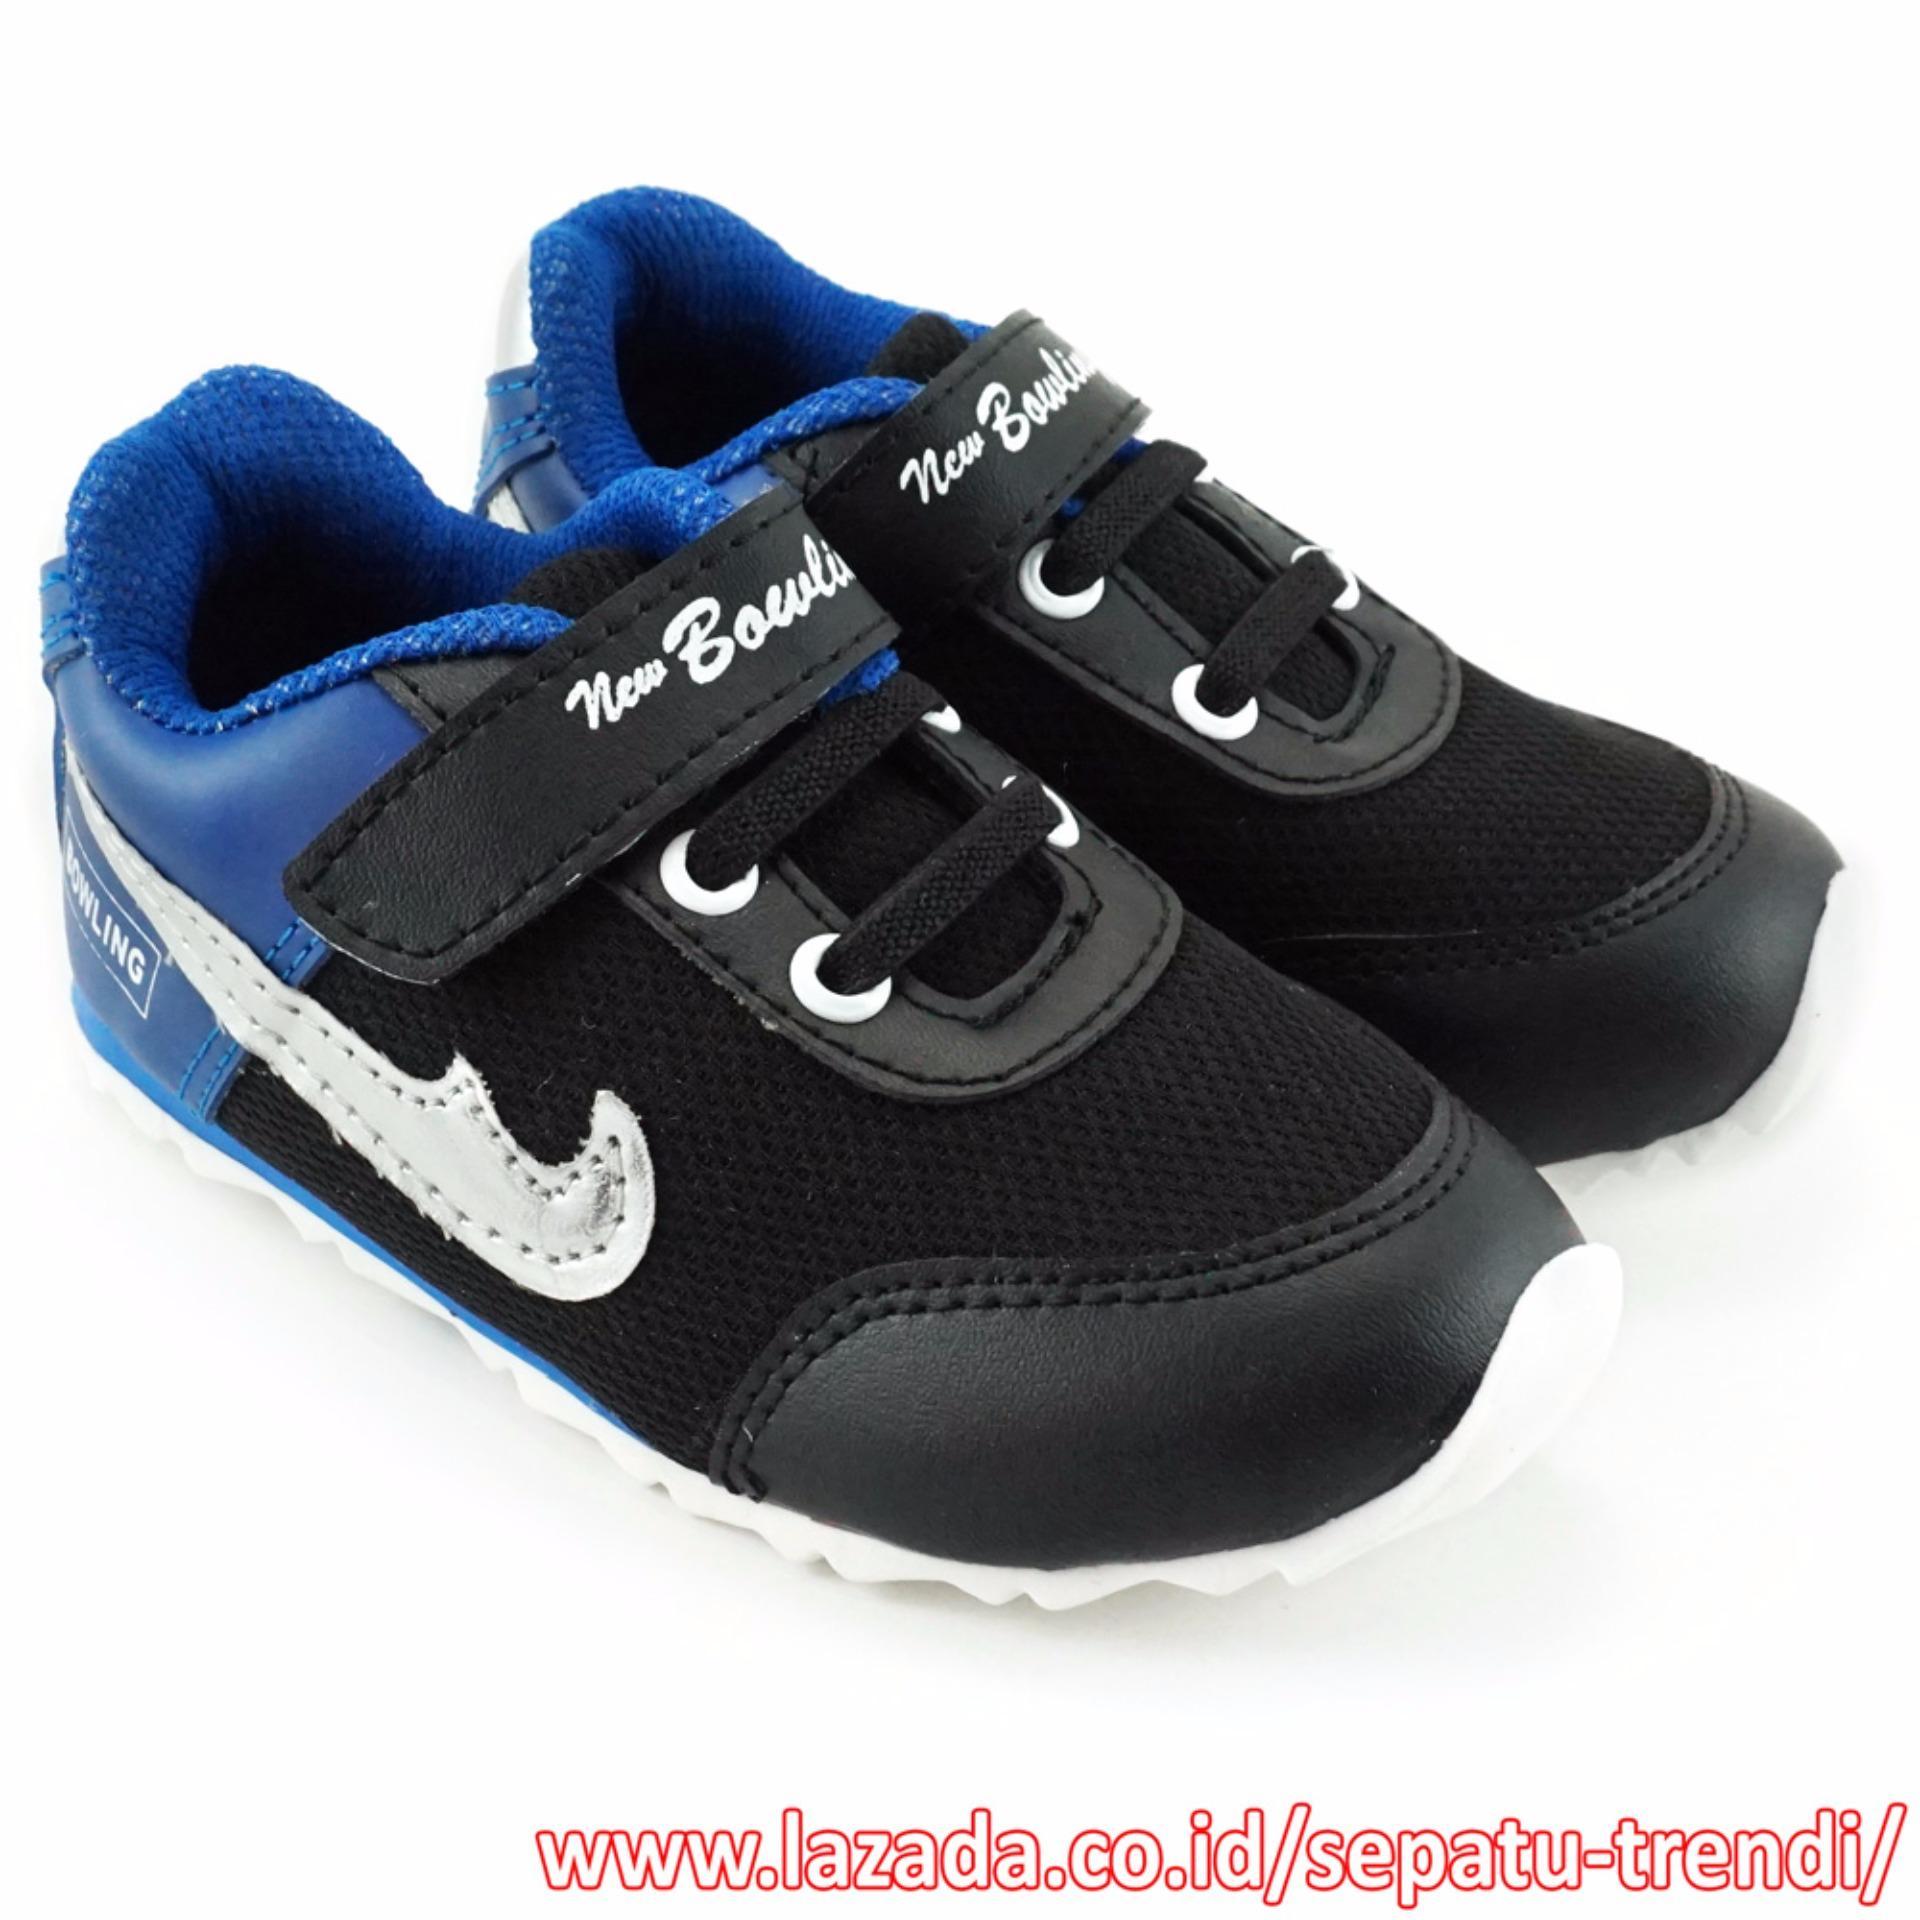 Jual Beli Trendishoes Sepatu Anak Sporty New Bowling Biru